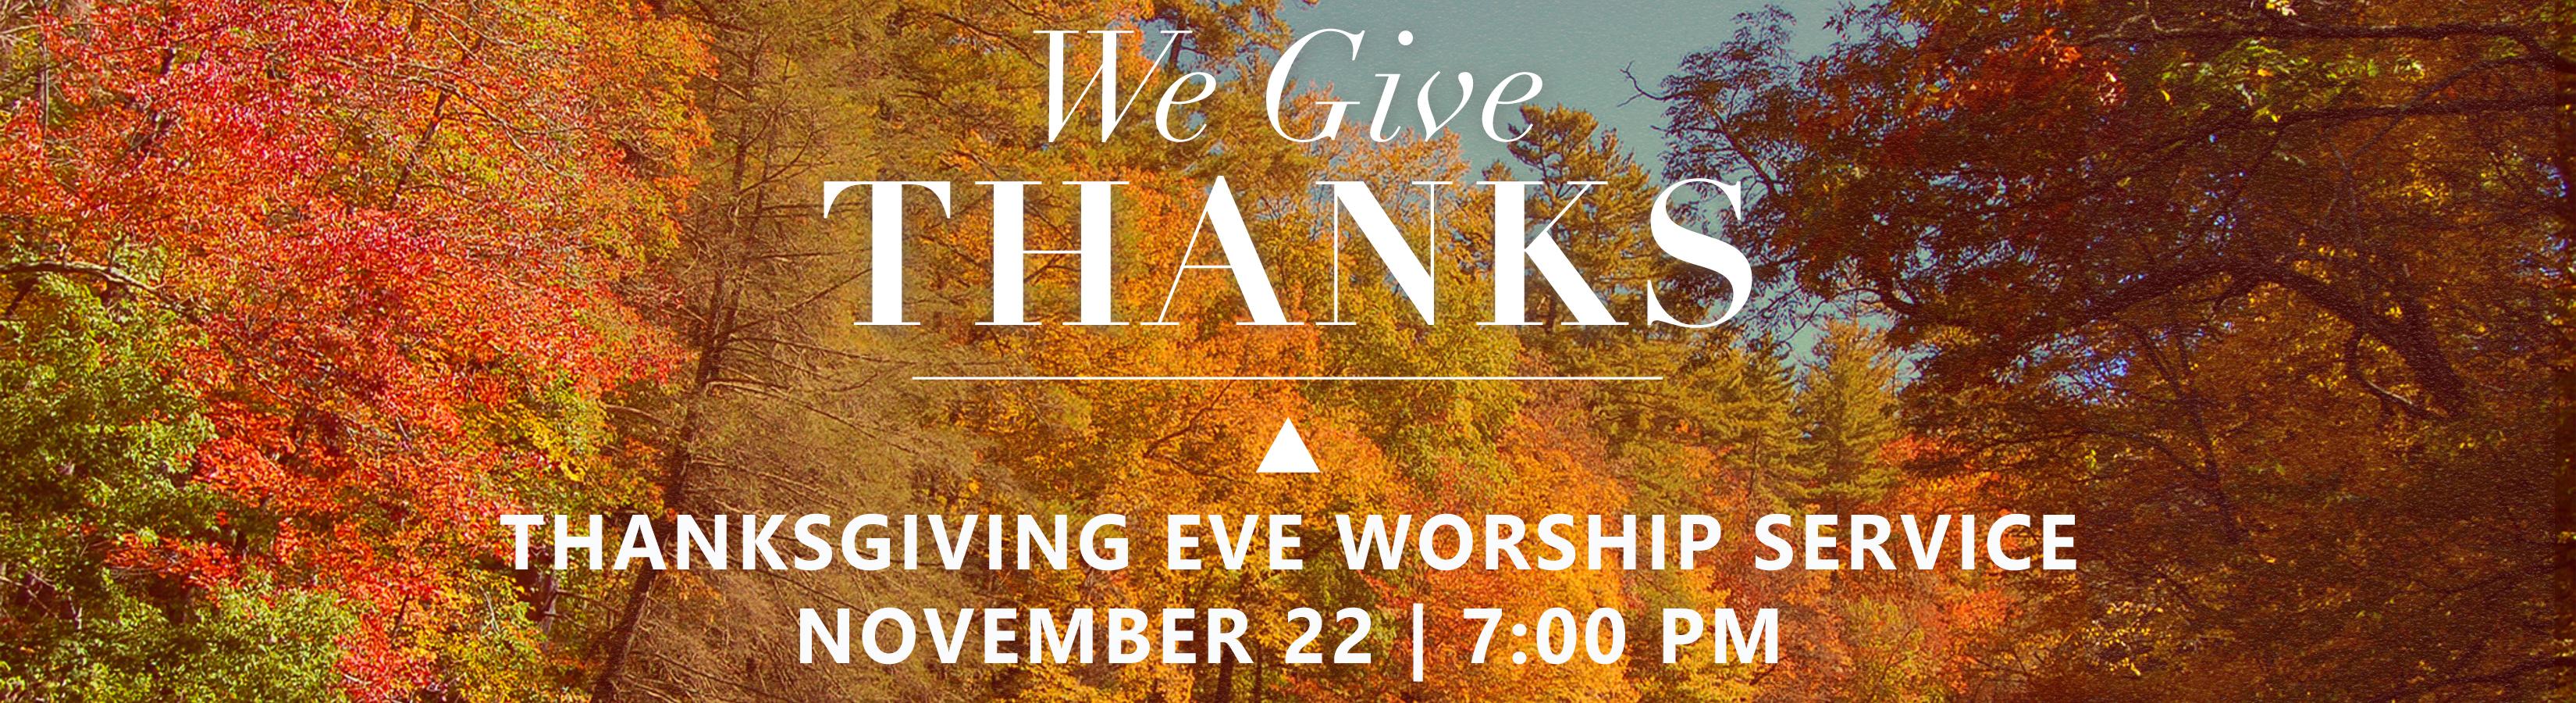 Thanksgiving Eve Worship Fall 2017